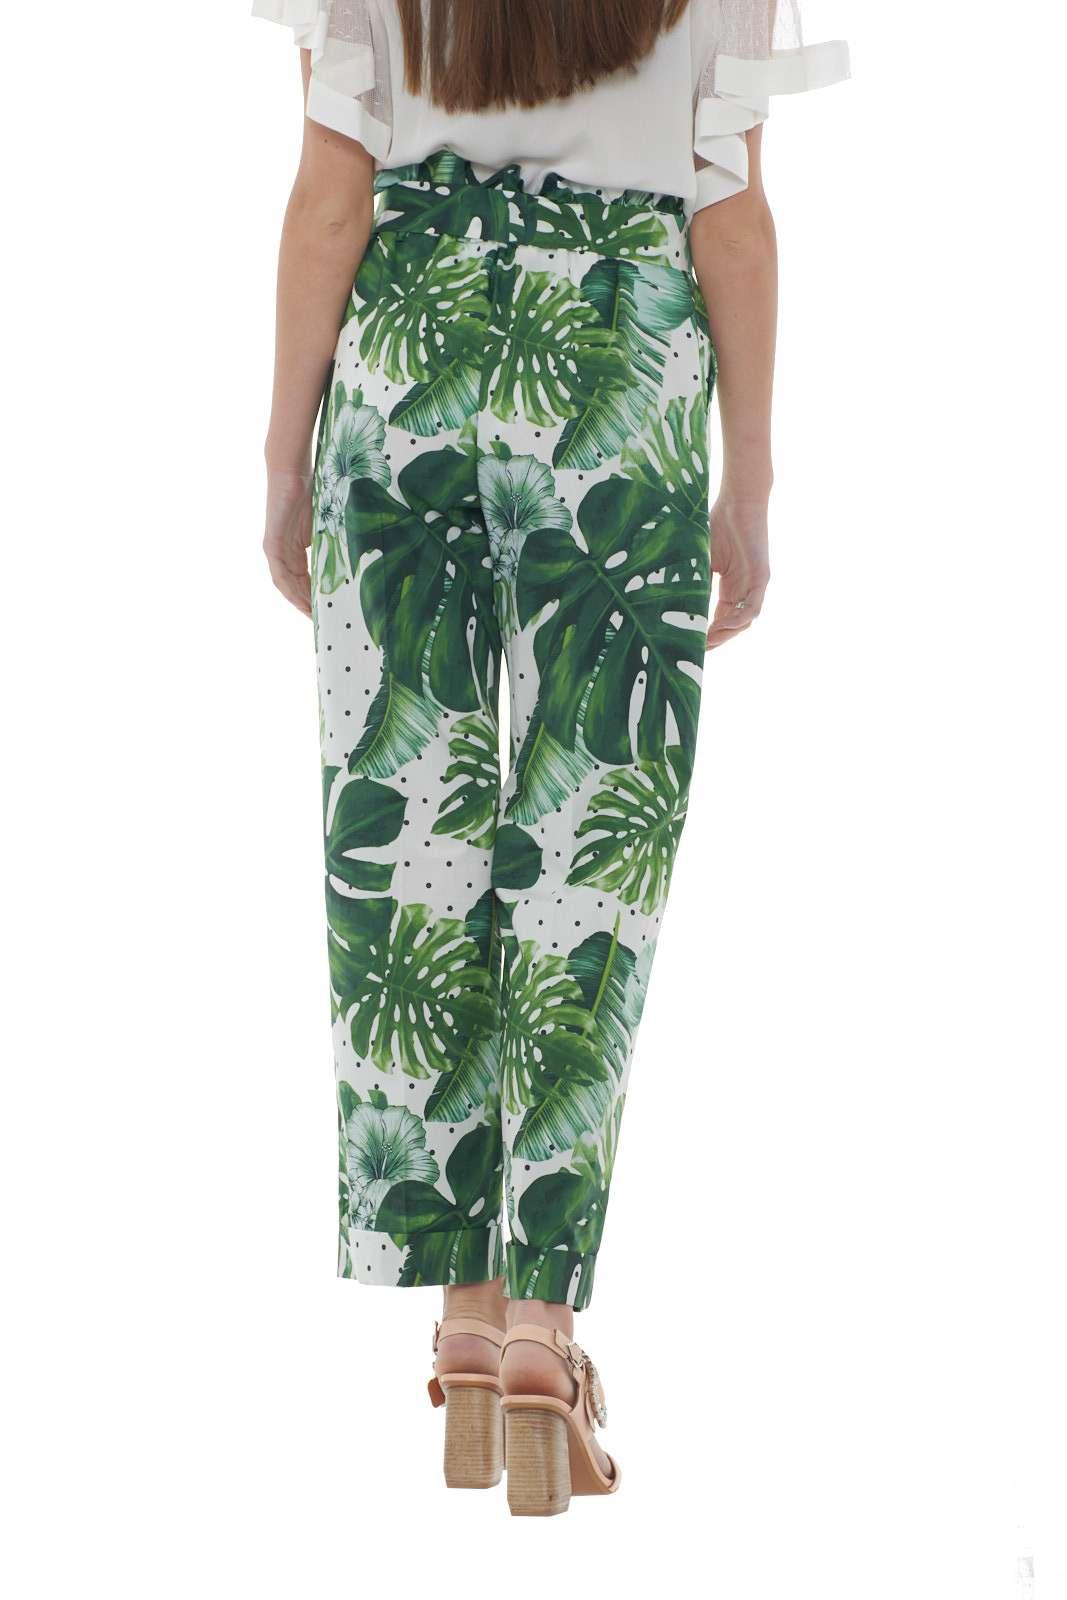 https://www.parmax.com/media/catalog/product/a/i/PE-outlet_parmax-pantaloni-donna-TwinSet-201TP2553-C.jpg